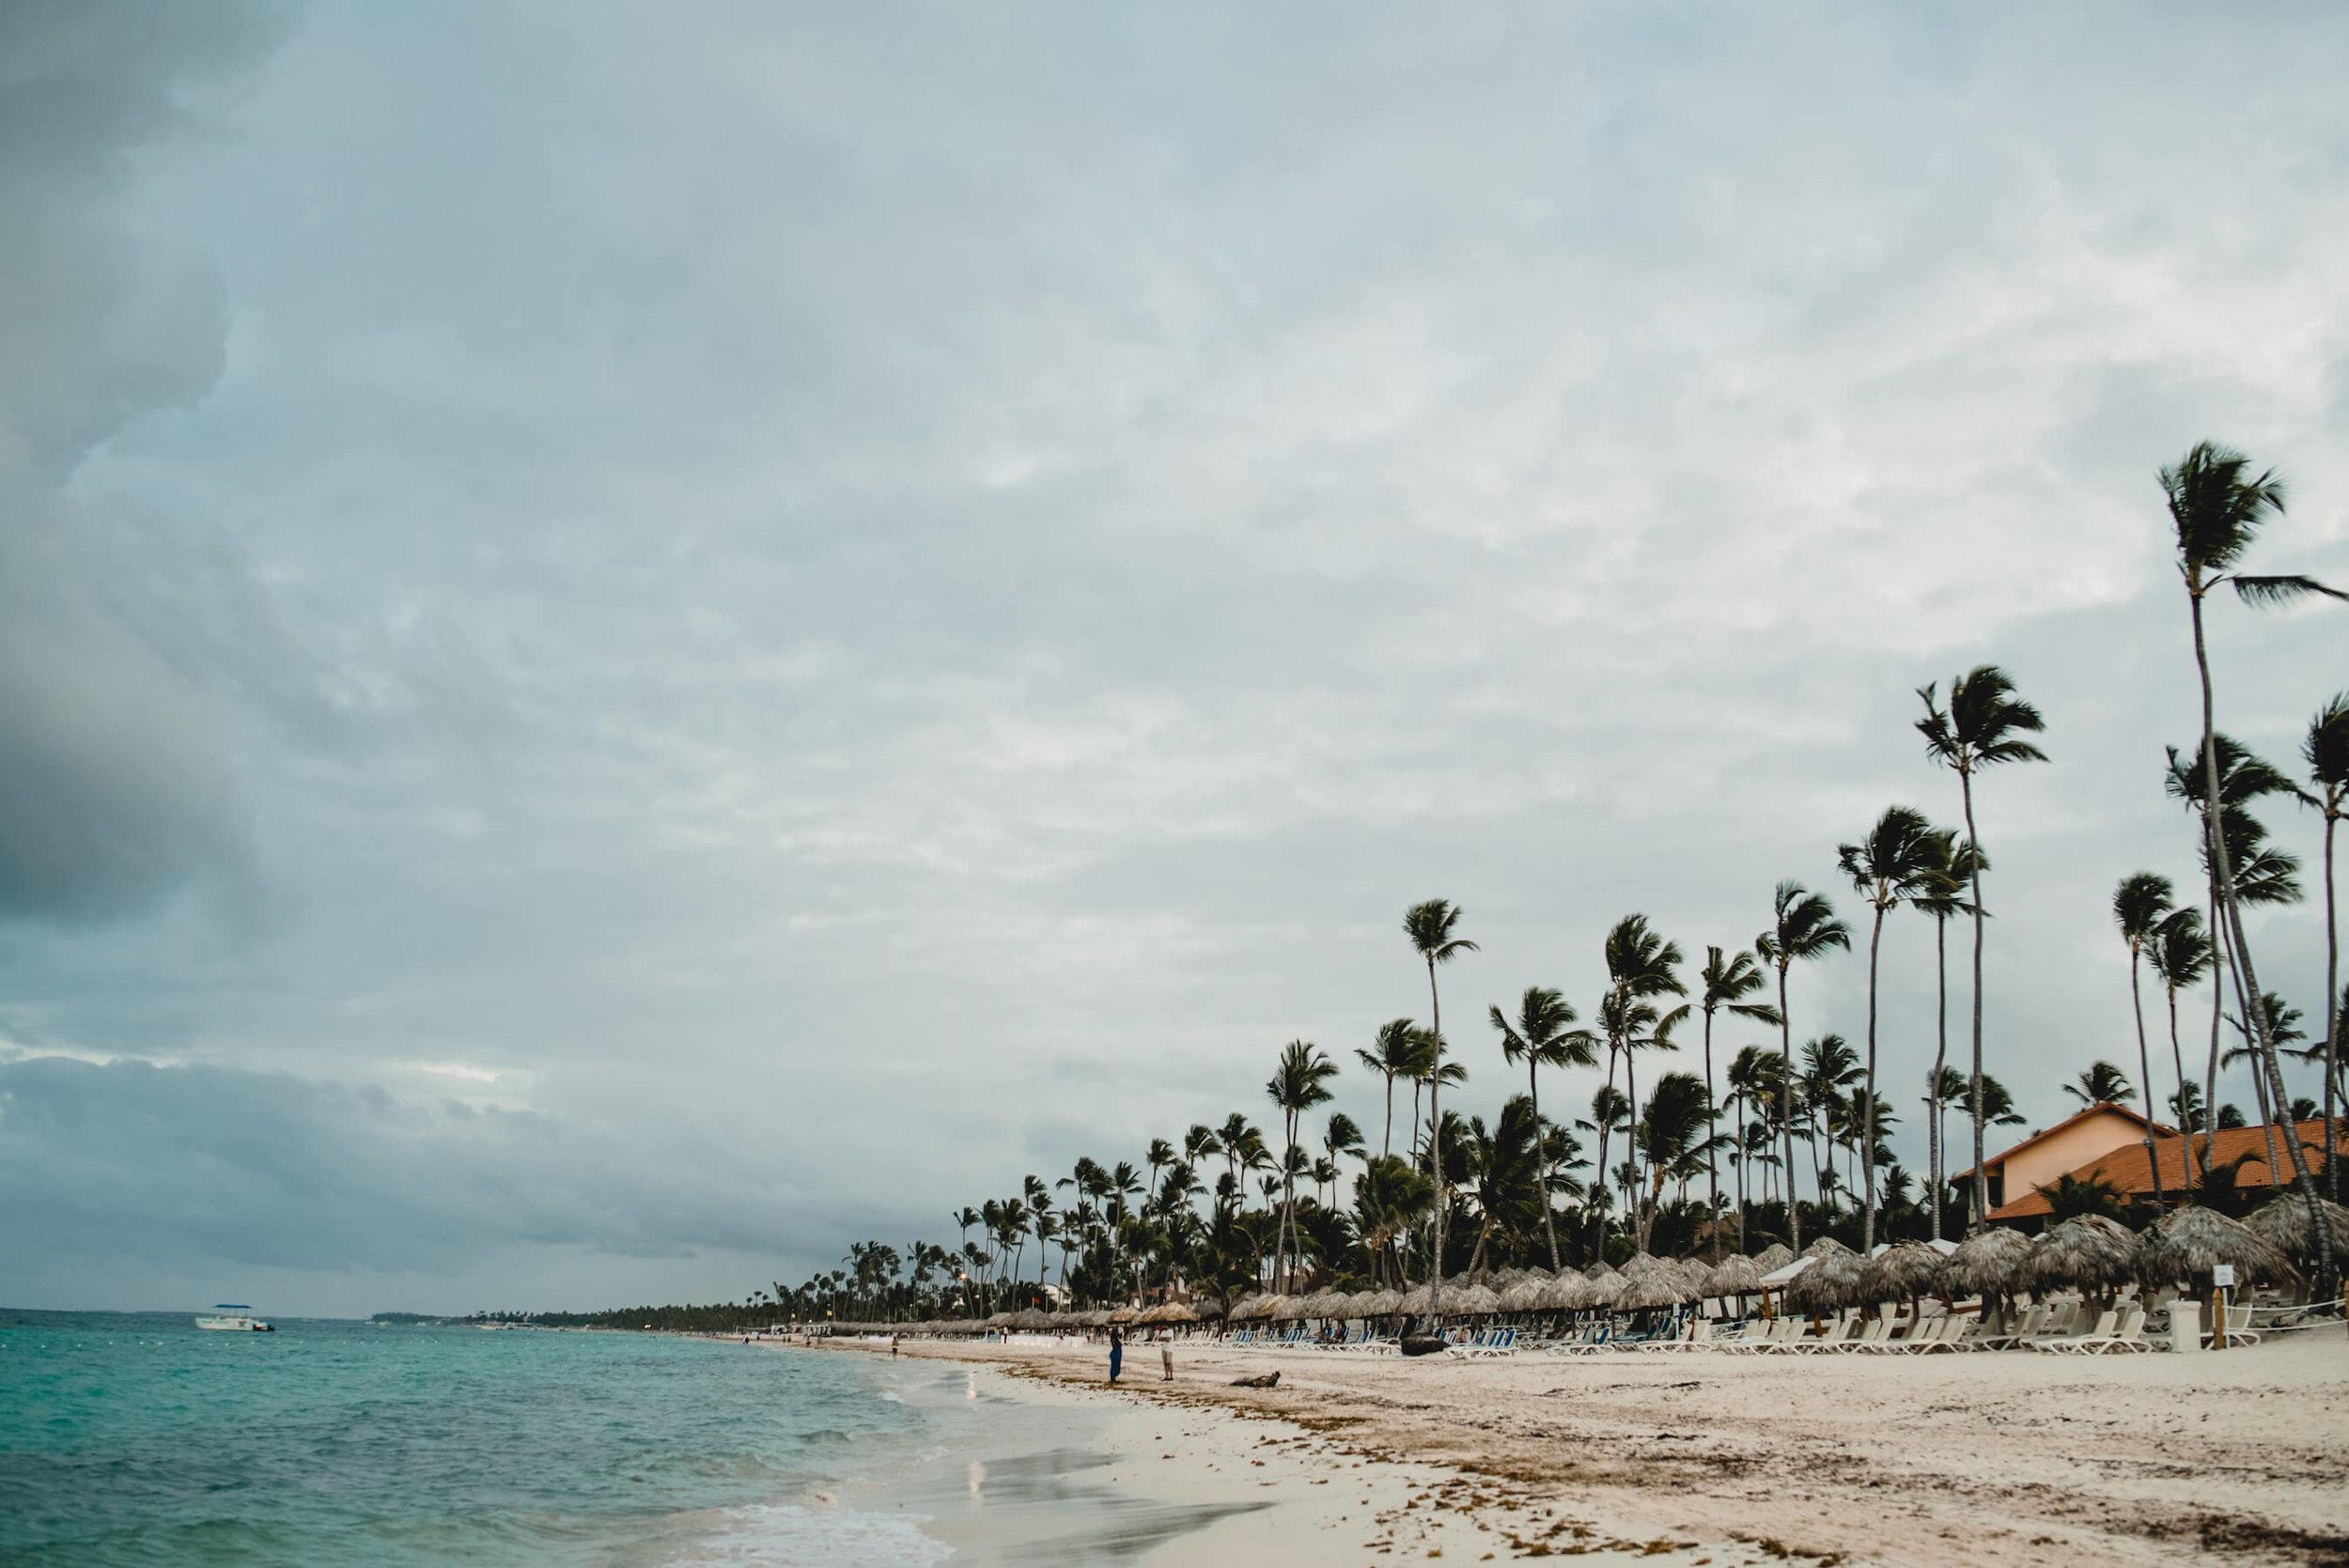 engle-olson-punta-cana-dominican-republic-9.jpg